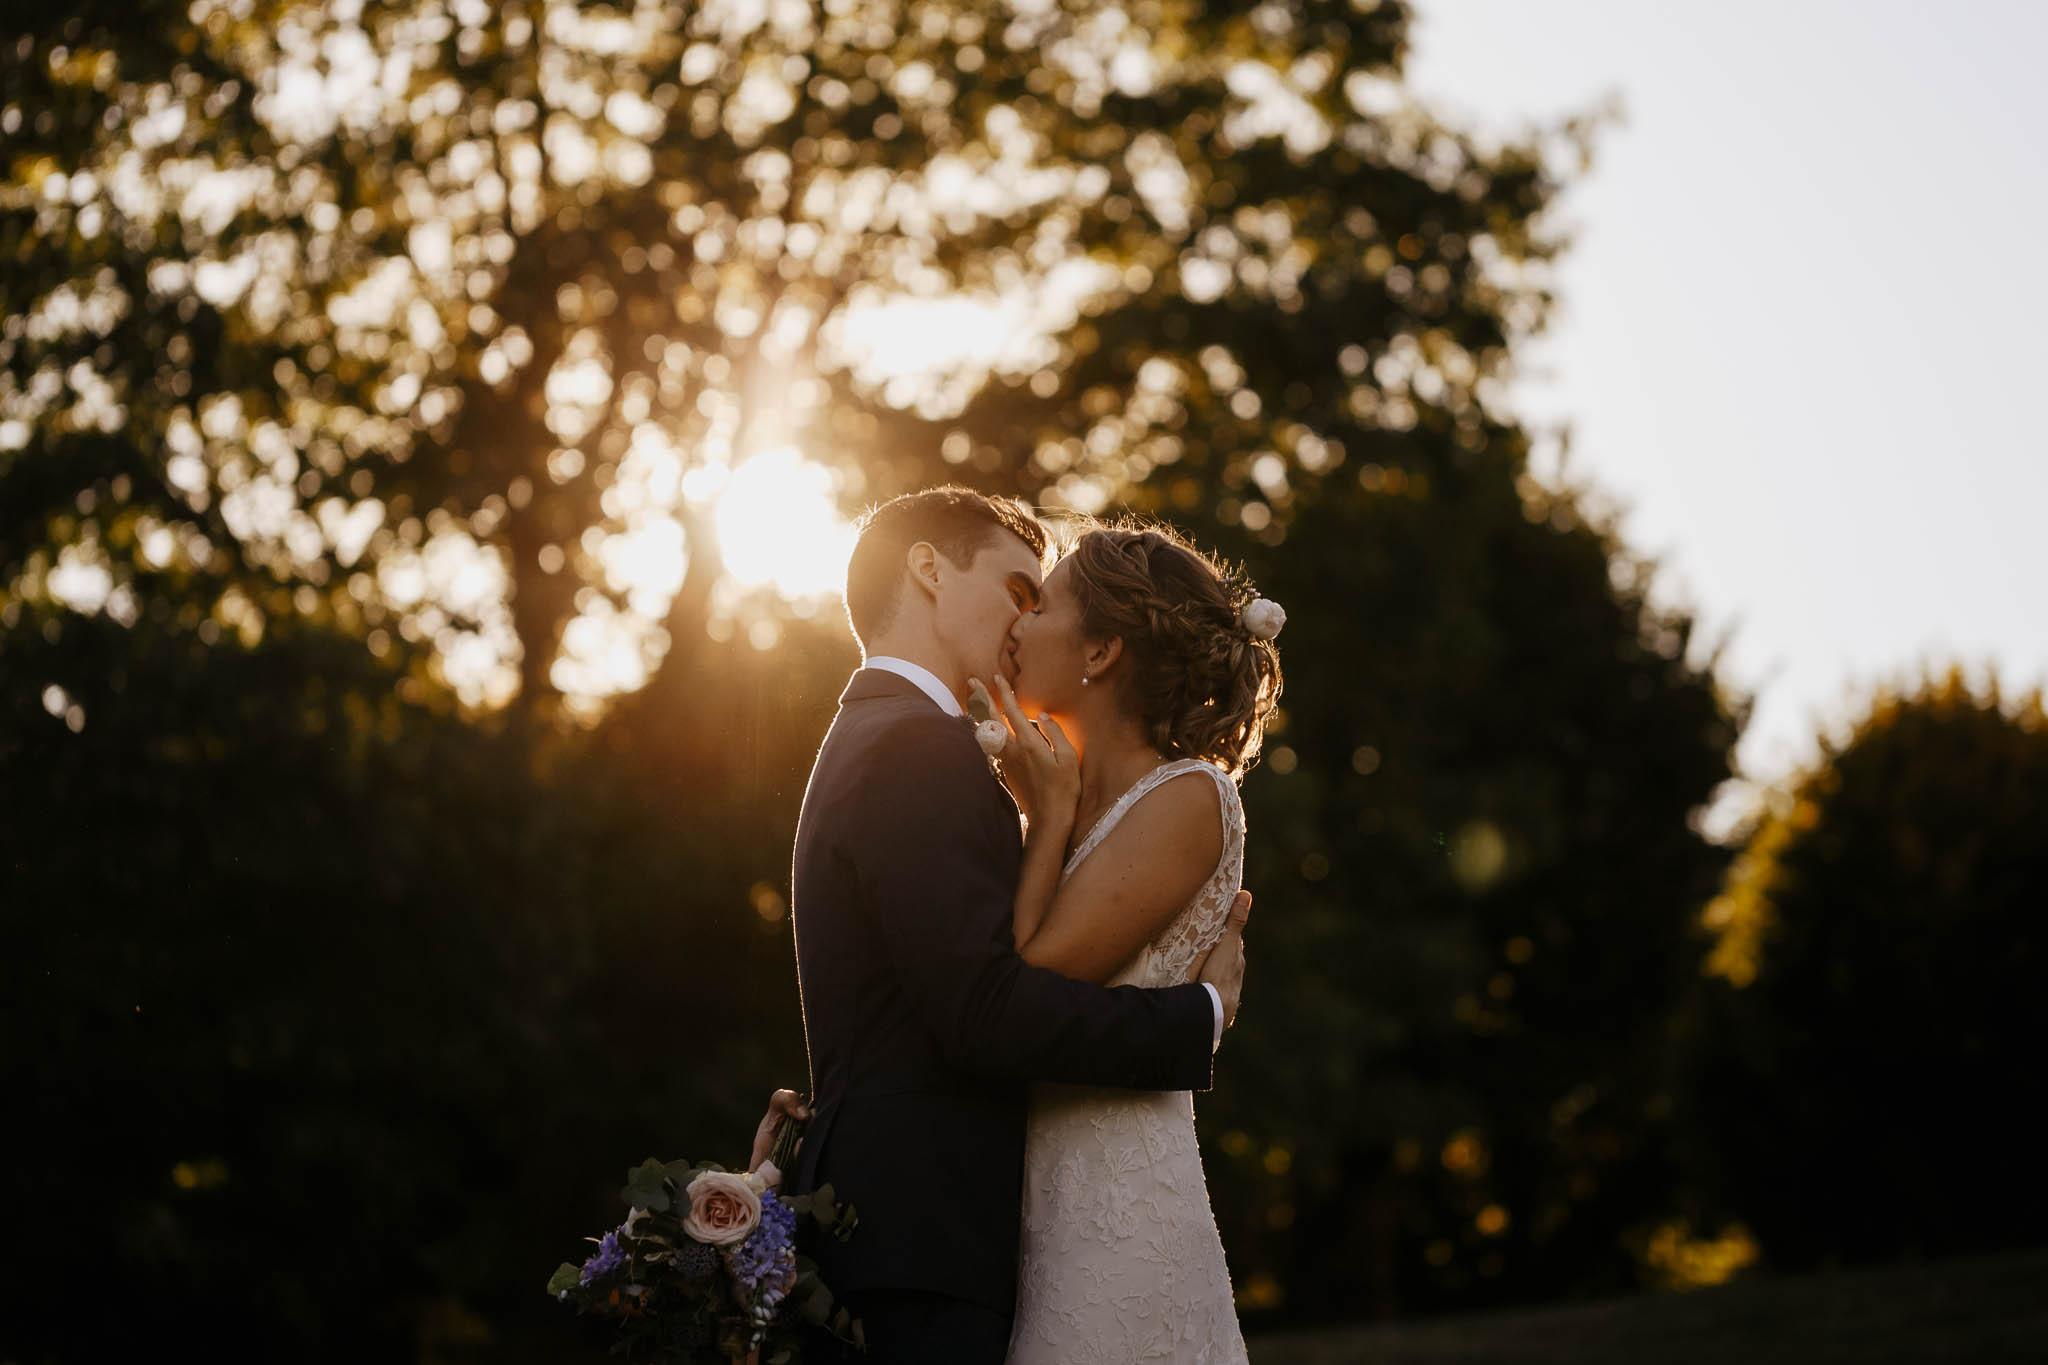 mariage-couple-verbust-ingold-107.jpg